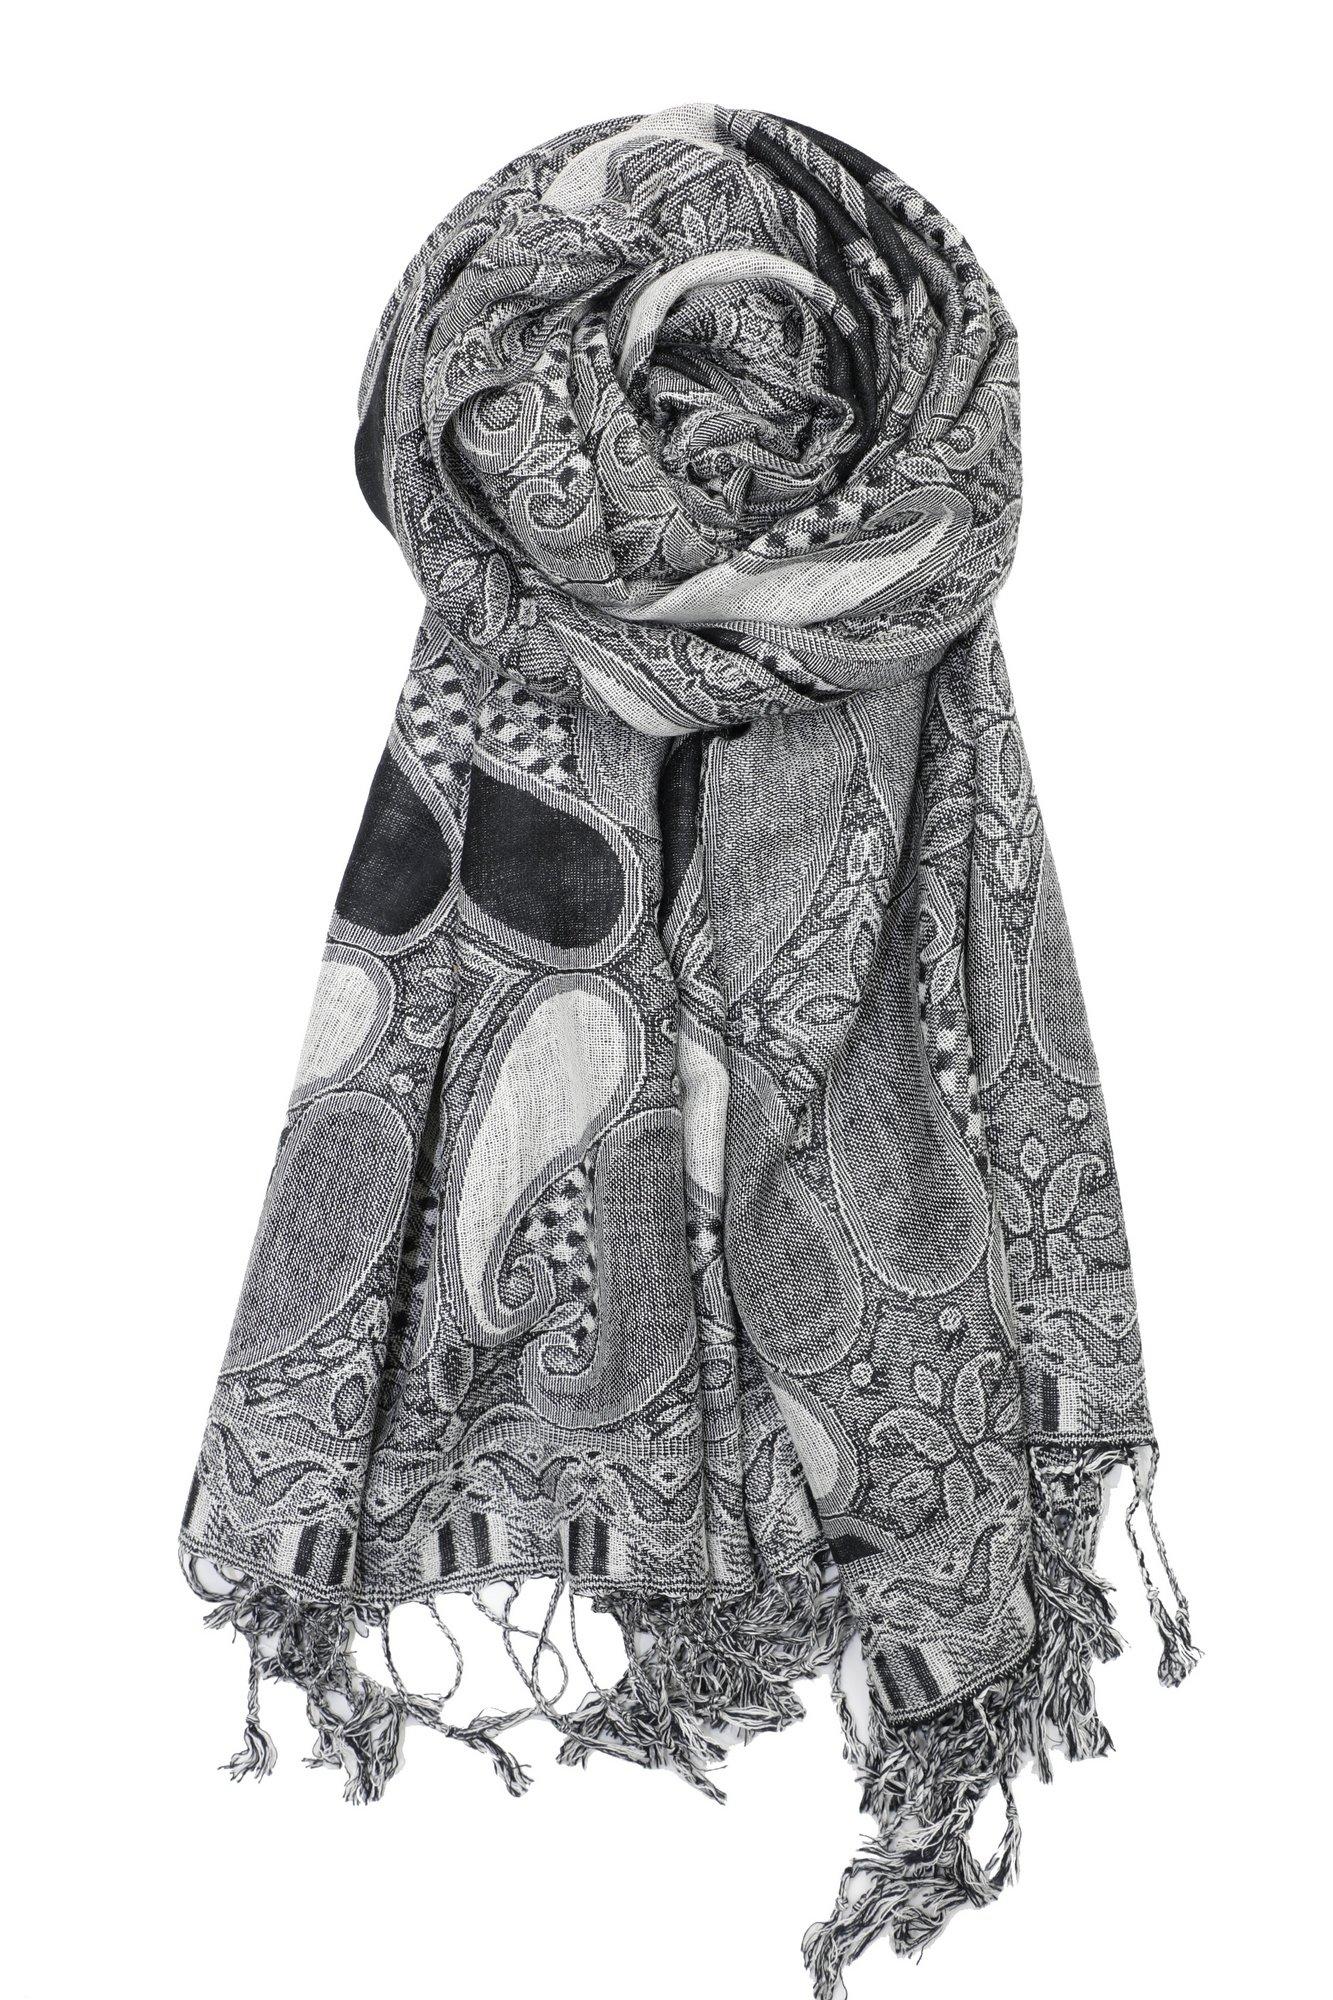 Achillea Soft Silky Multi Color Paisley Pashmina Double Layered Shawl Scarf Wrap Stole (Black White)